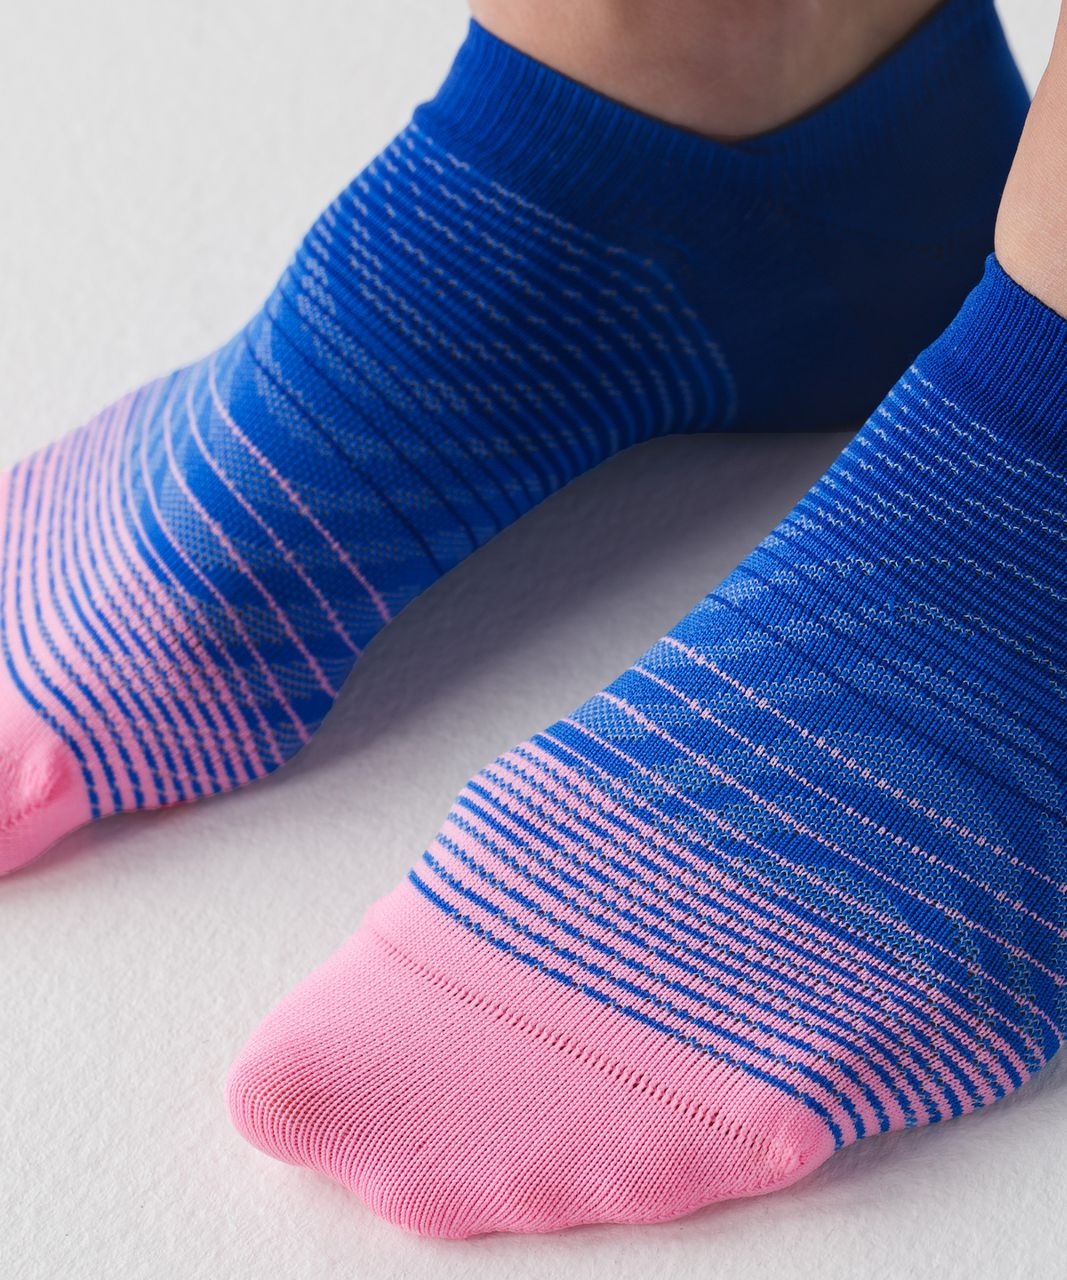 Lululemon Play All Day Sock - Pink Shell / Pipe Dream Blue / Harbor Blue